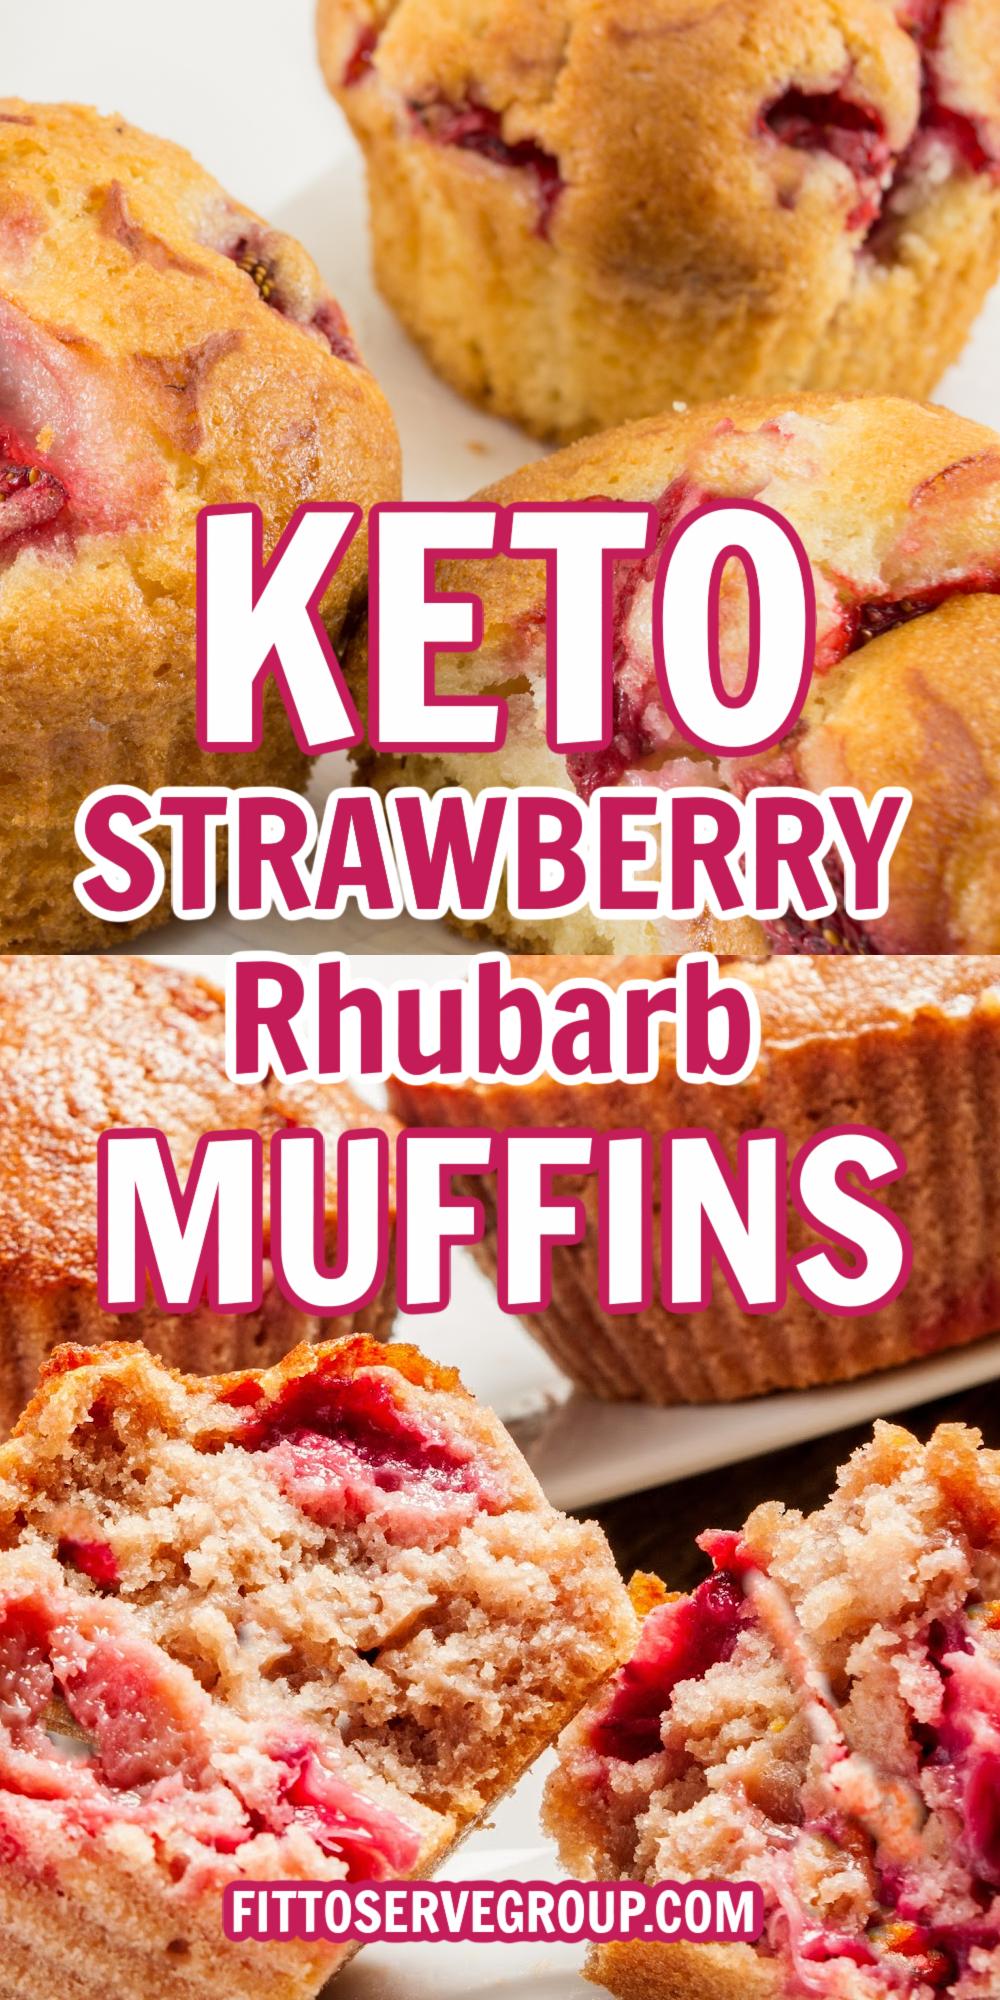 keto strawberry rhubarb muffins long pin